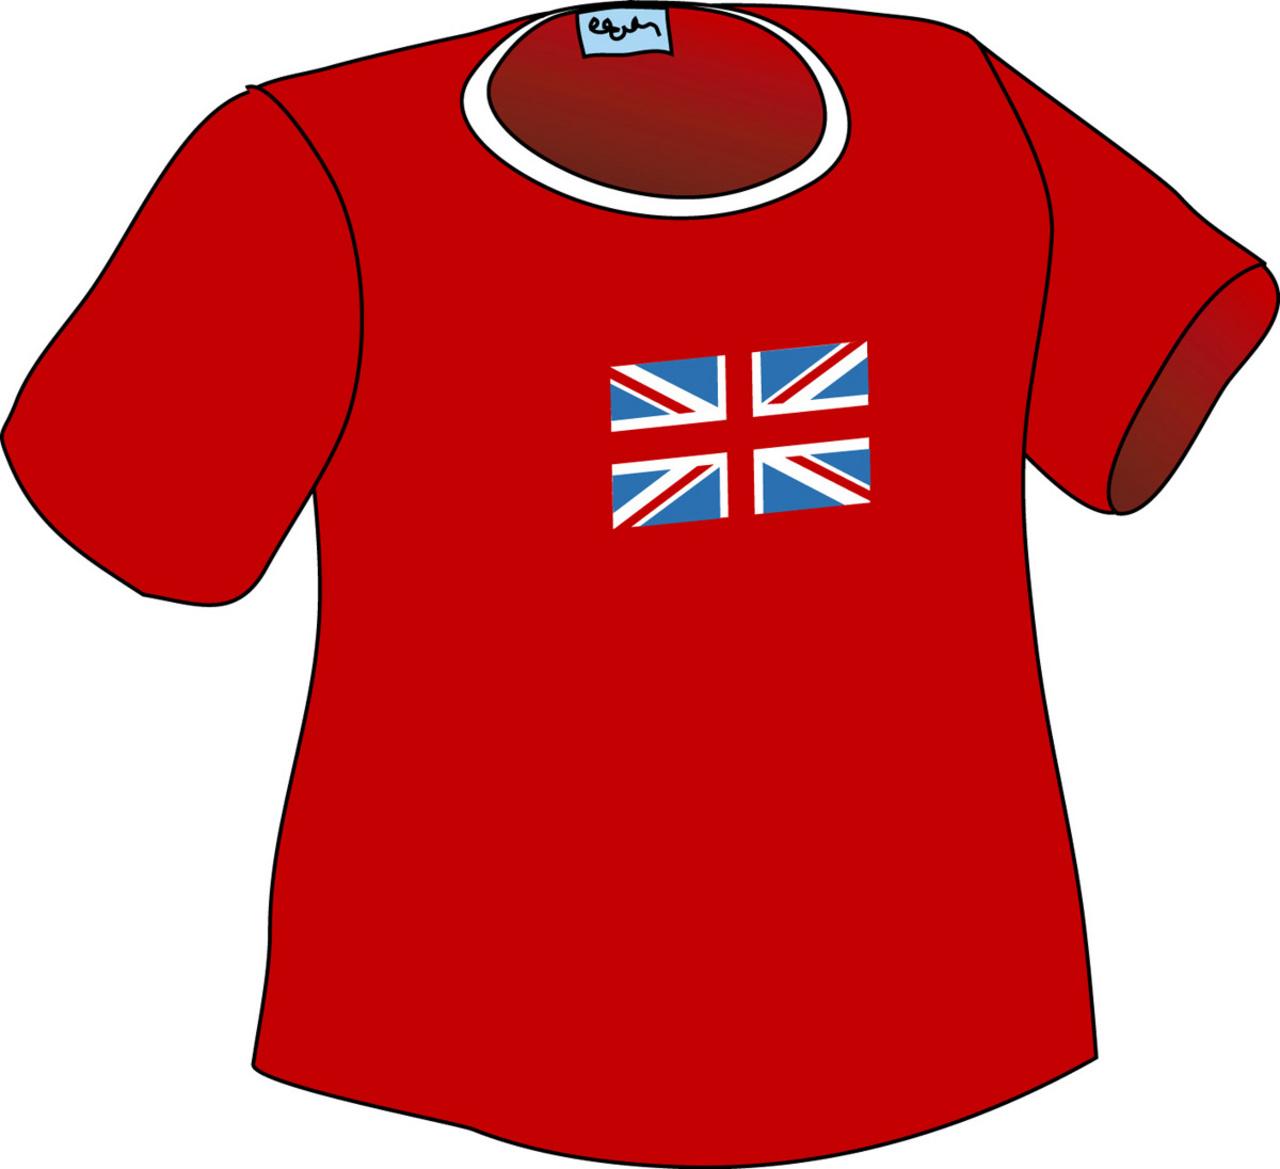 rødt t skjorte nynorsk